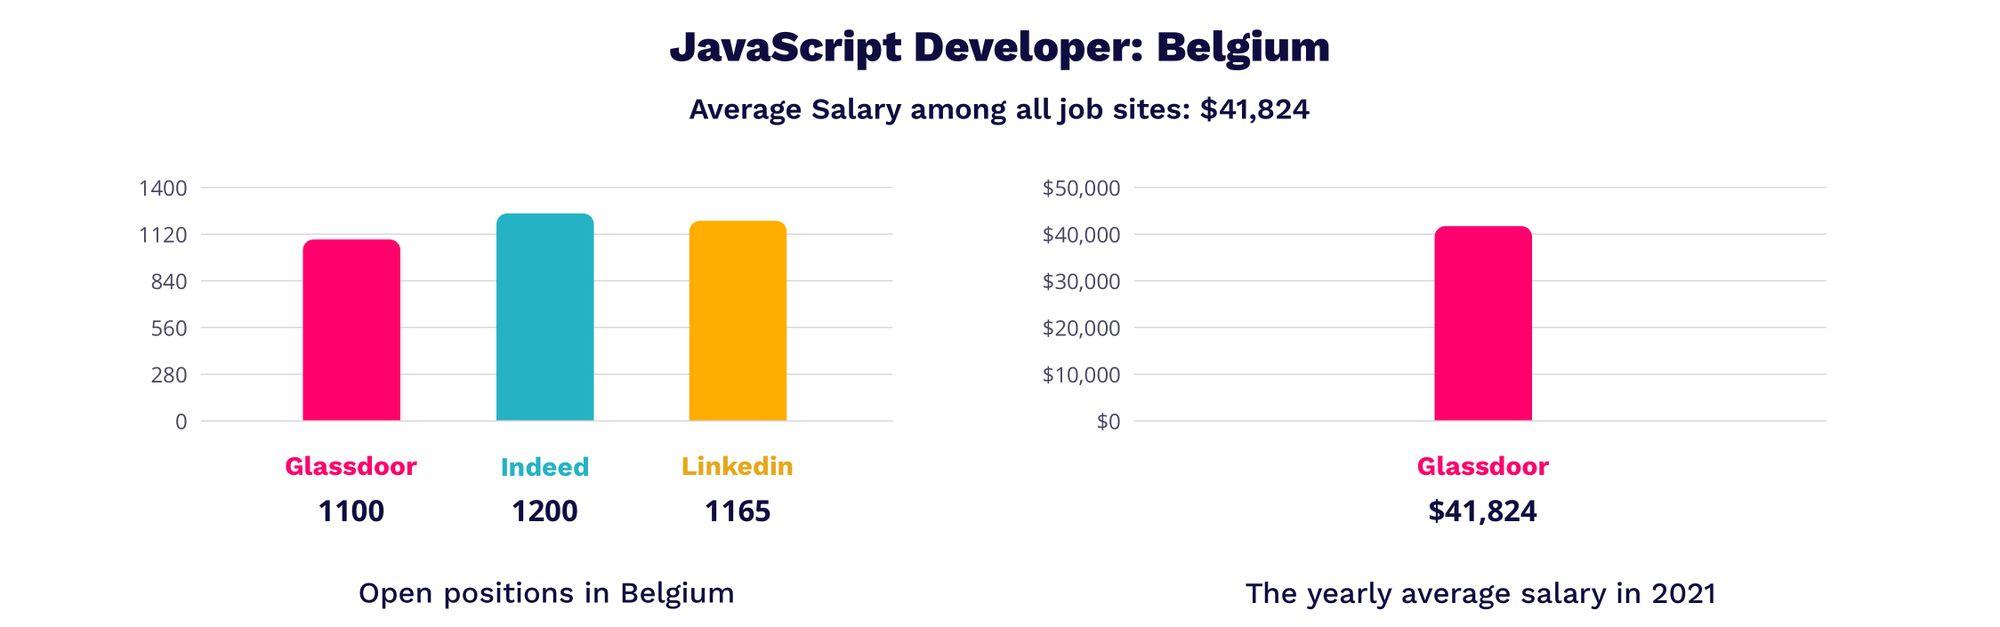 javascript developer salary in Belgium